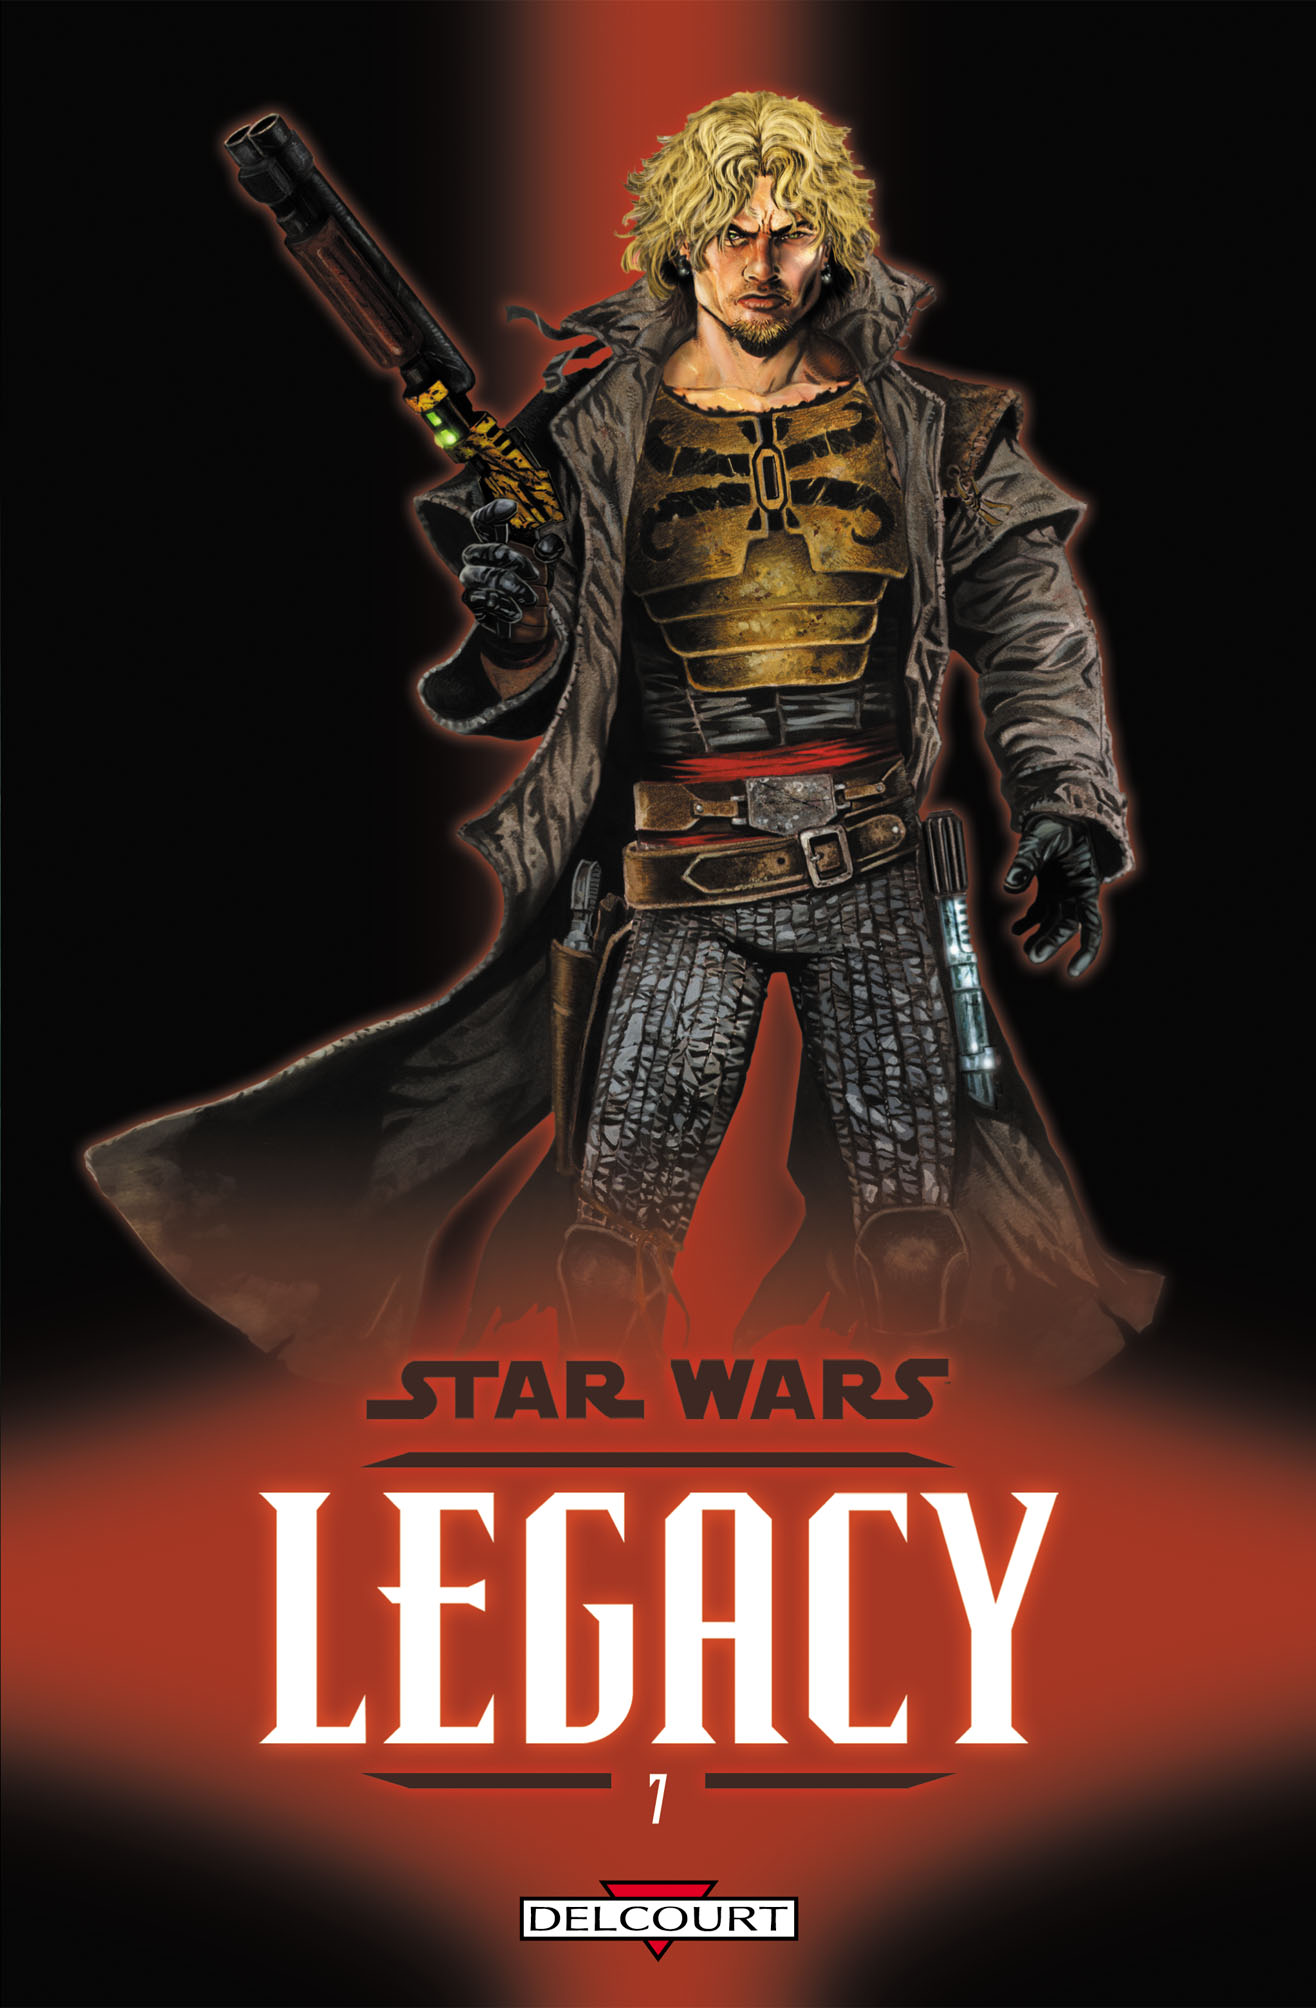 Star Wars - Legacy 7 - Tatooine